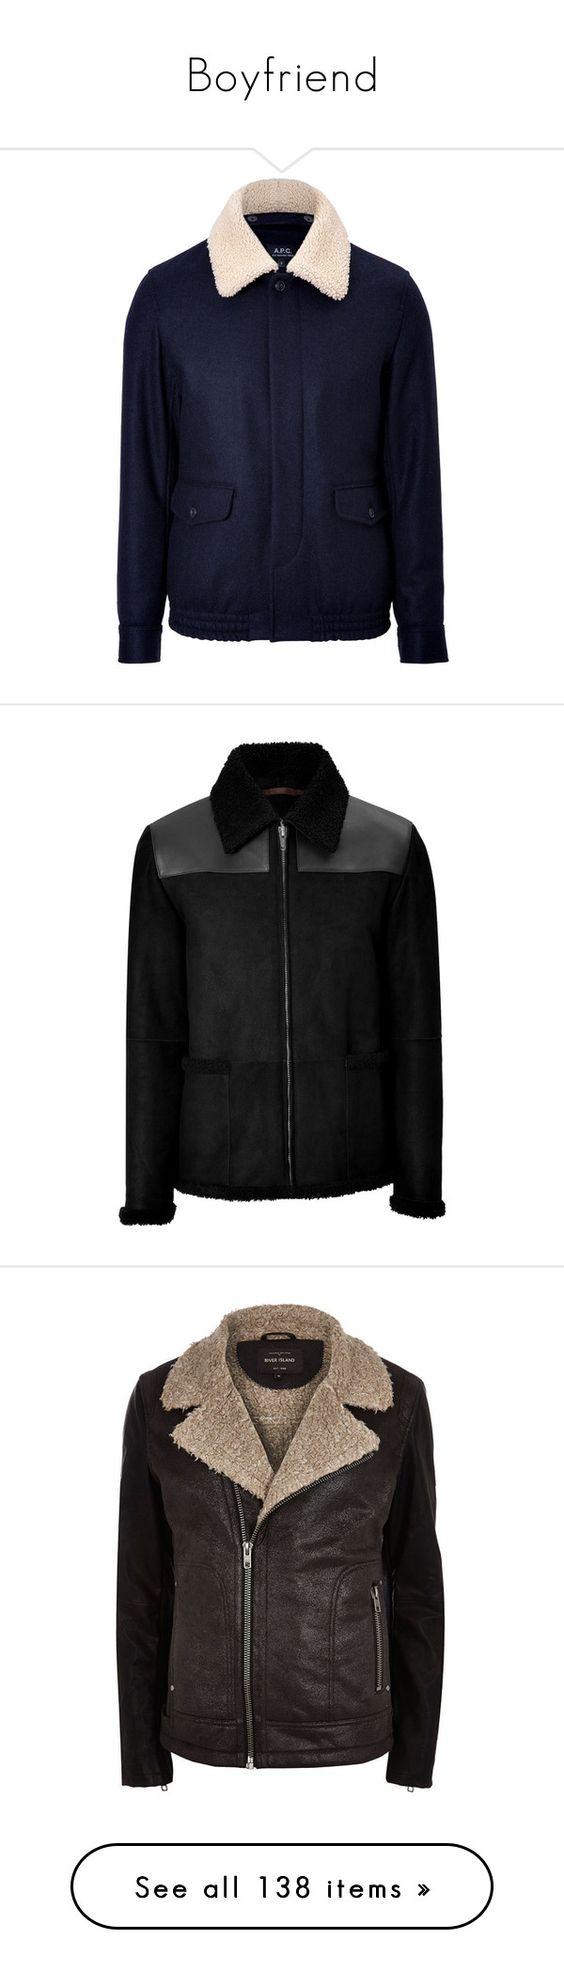 """Boyfriend"" by irisneline ❤ liked on Polyvore featuring men's fashion, men's clothing, men's outerwear, men's coats, men's jackets, nick hudson, black, jackets, sale y outerwear"